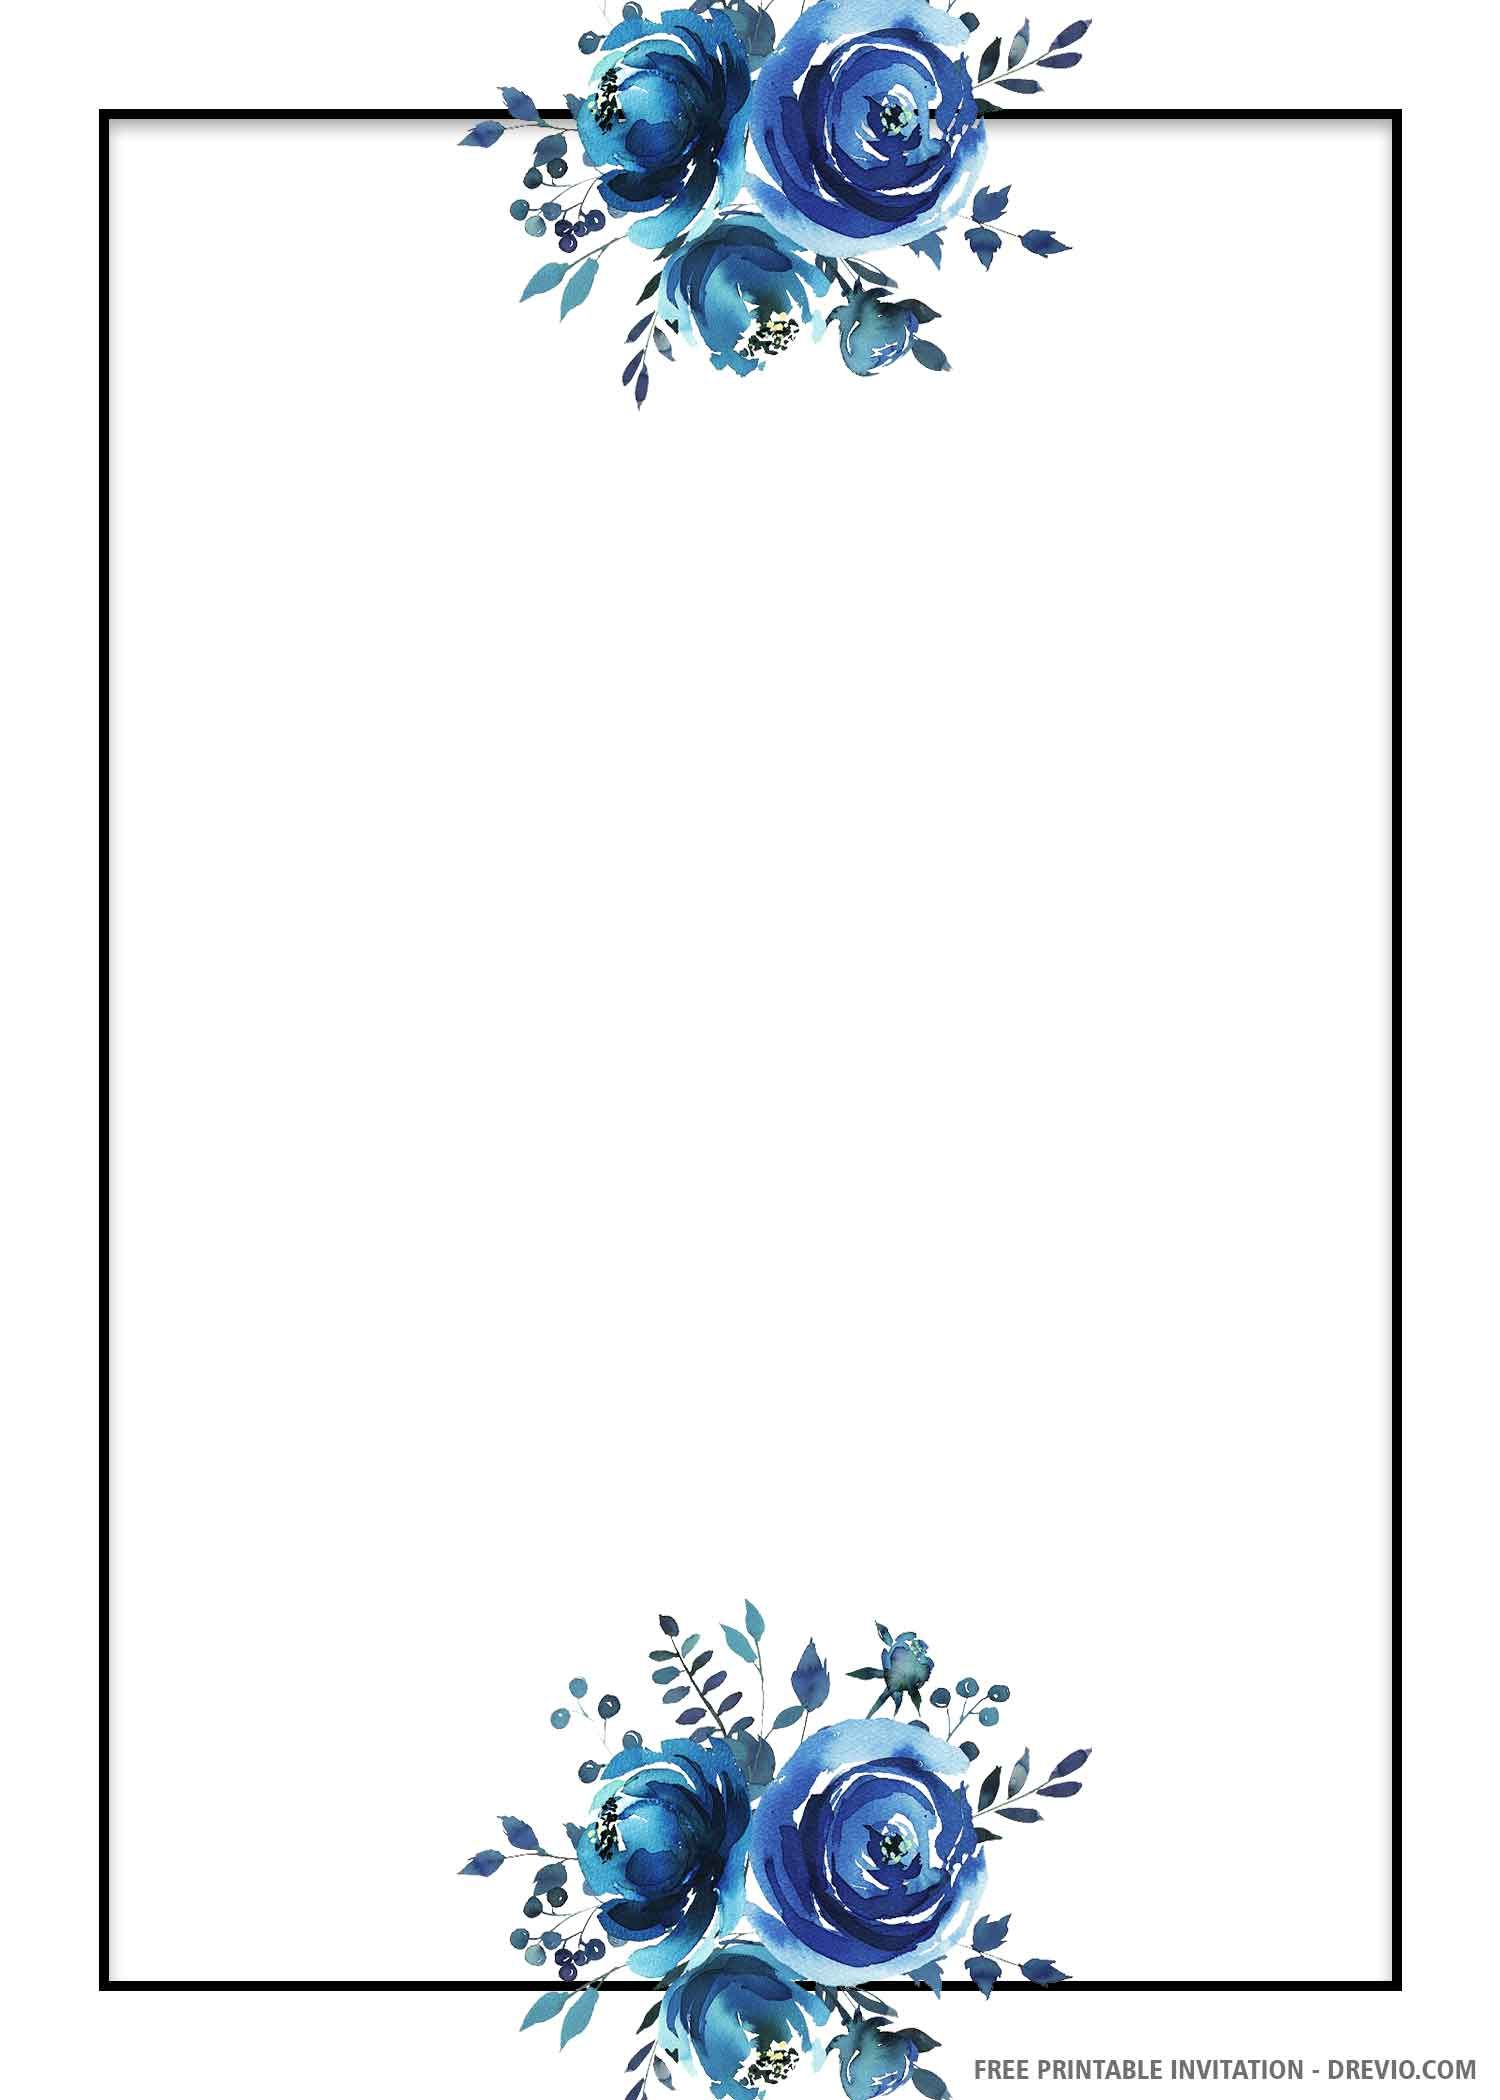 Free Printable Blue Floral Wedding Invitation Template Drevio Floral Wedding Invitations Free Wedding Invitation Templates Wedding Invitation Background